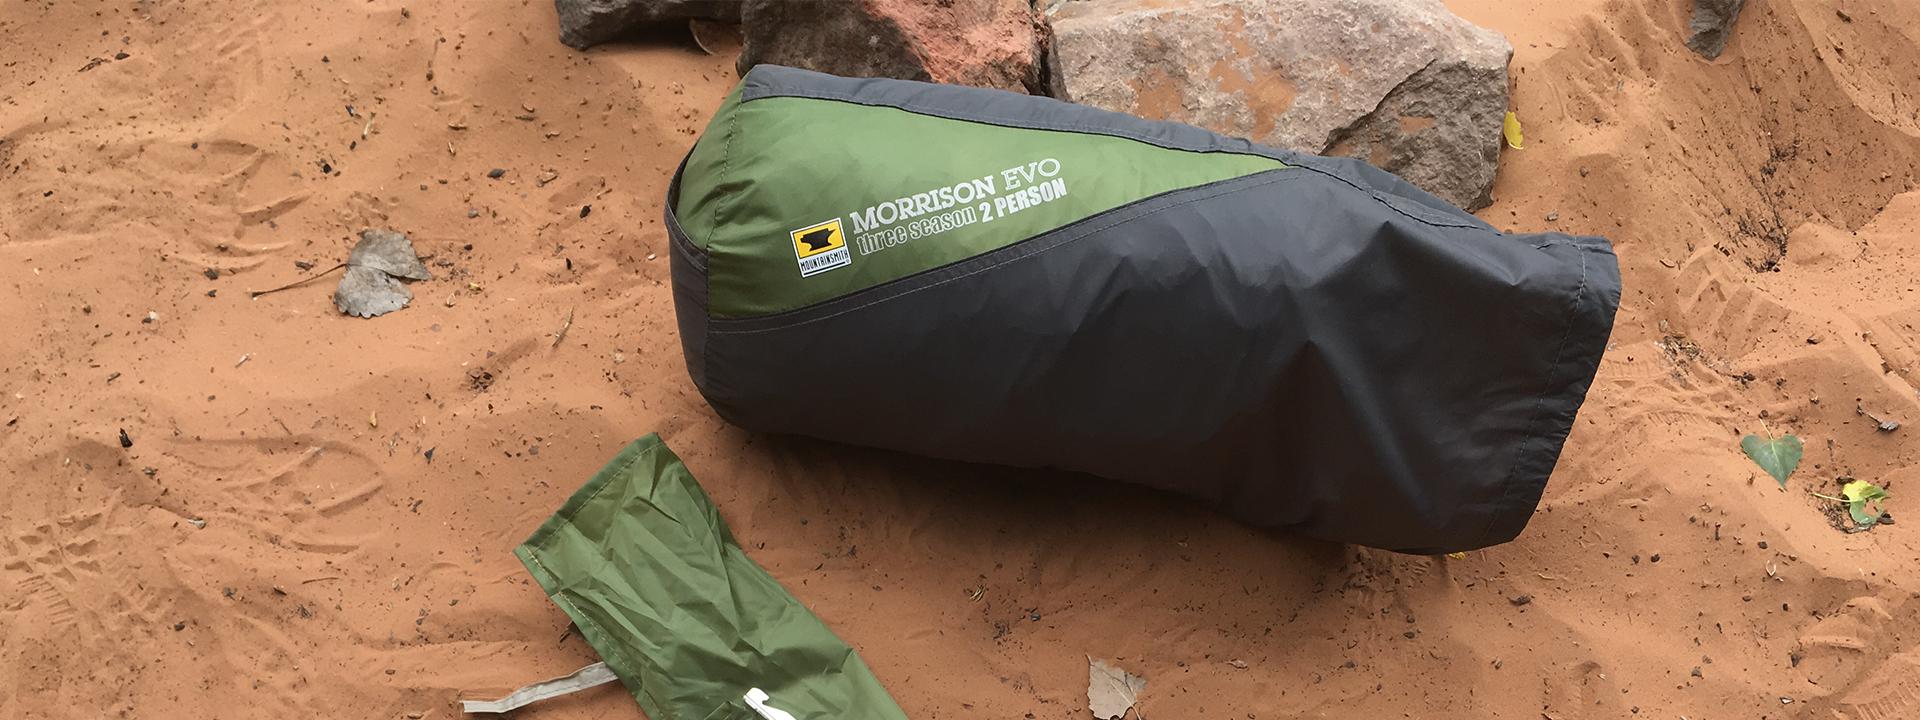 ProView u2013 Mountainsmith Morrison Evo Tent & Mountainsmith Morrison Evo Tent Review | Dirtbag Dreams Gear Reviews